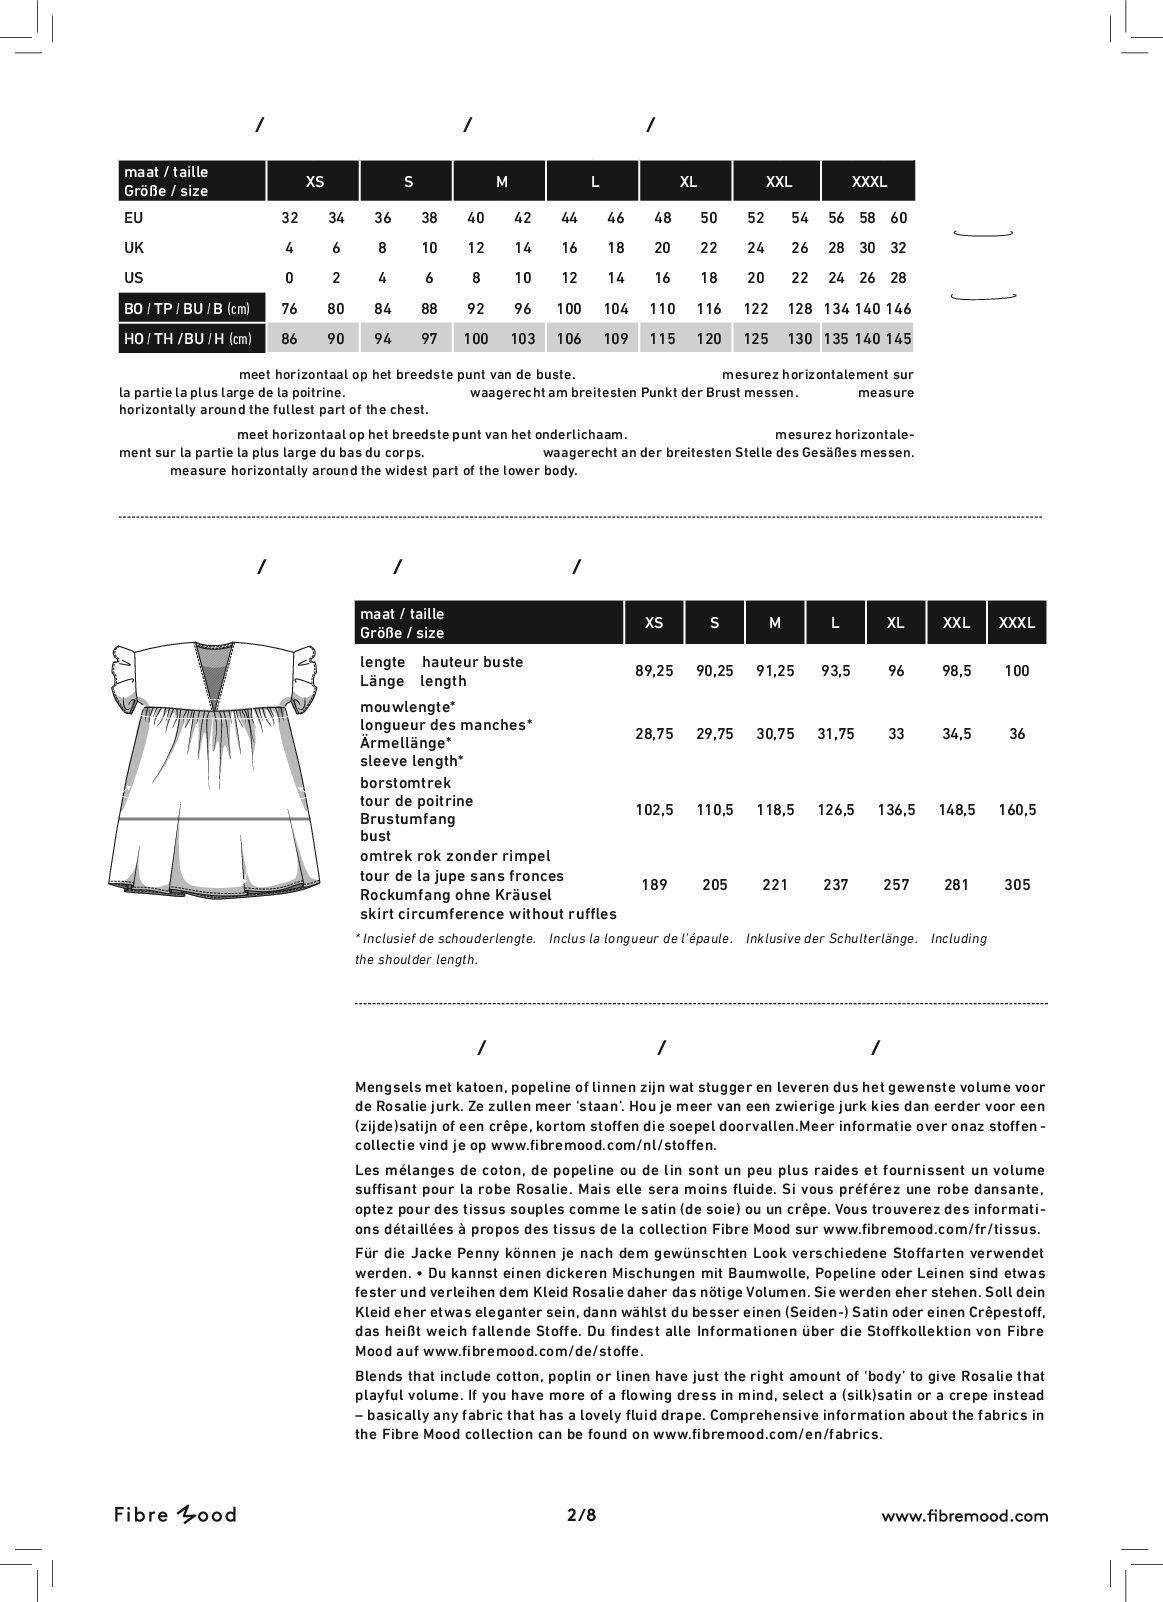 rosalie_size_chart